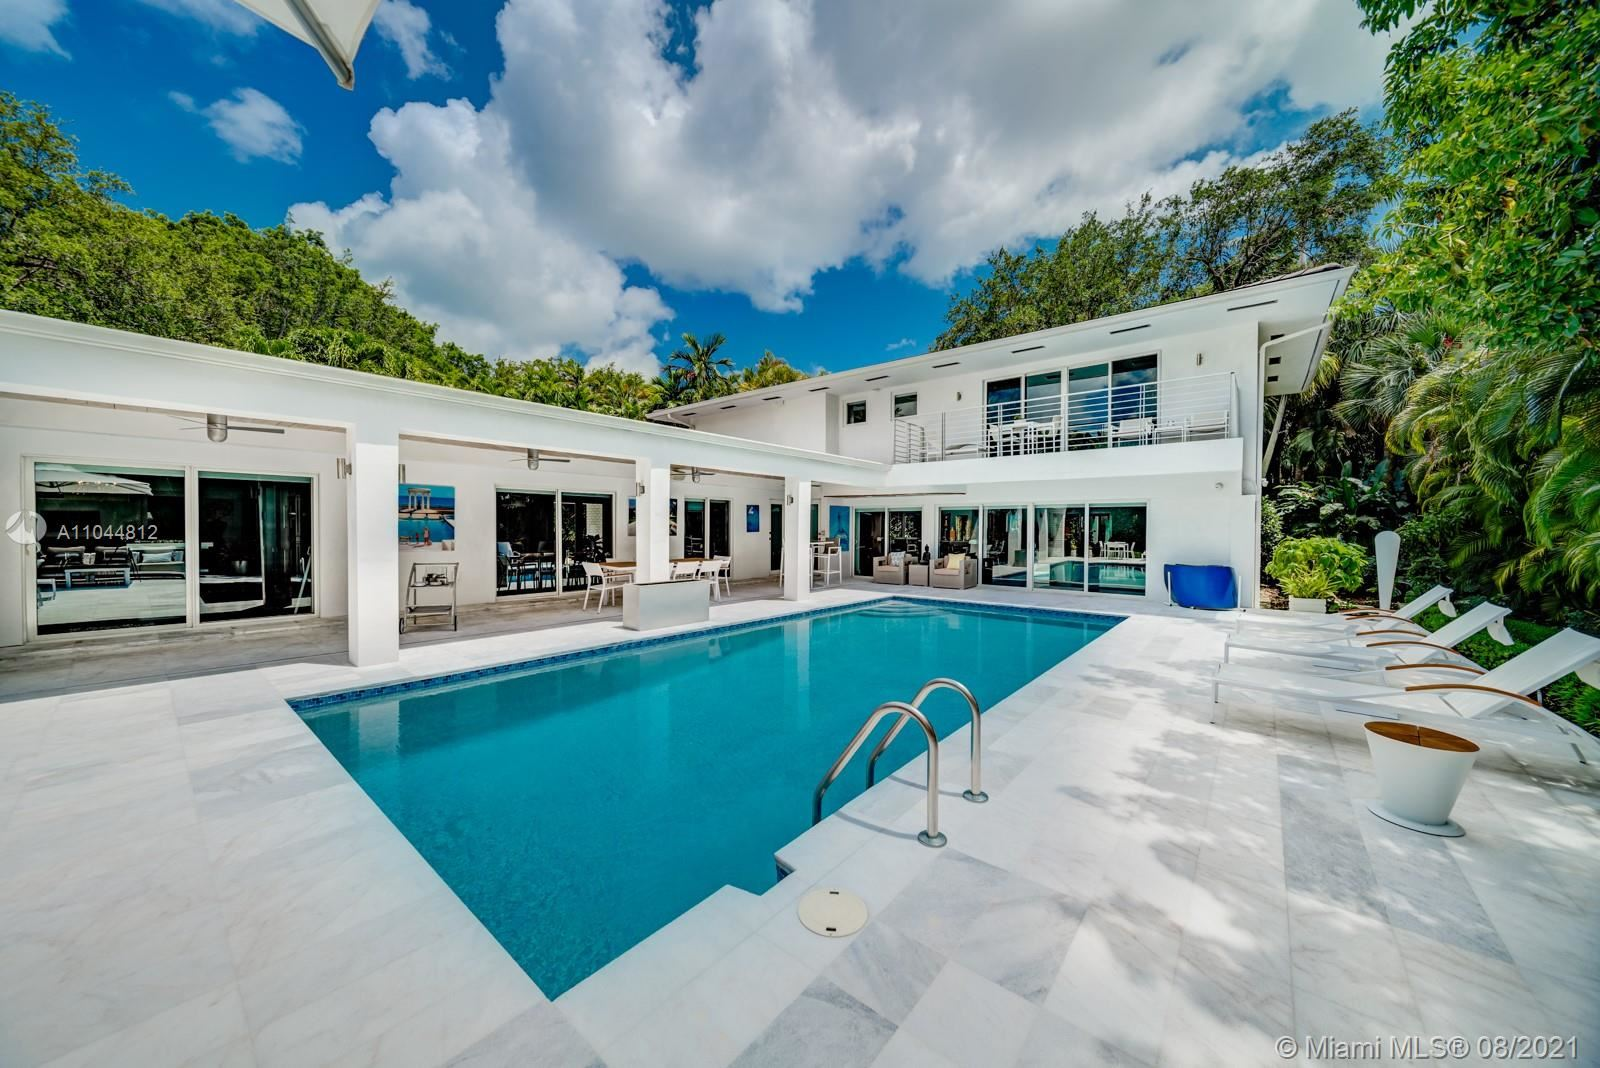 4150 Bay Point Rd, Miami, FL 33137 - #: A11044812